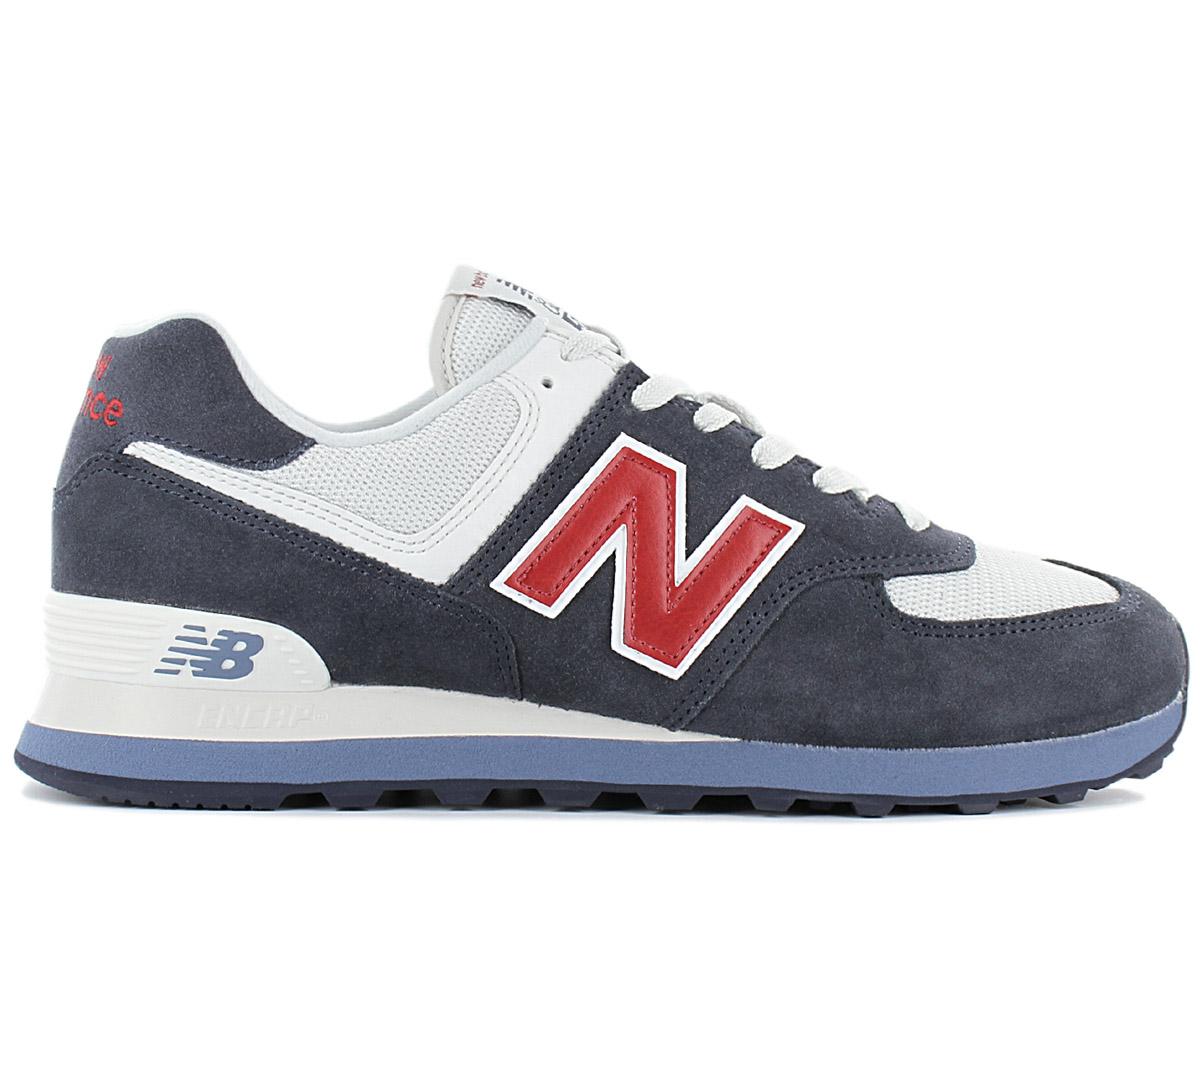 Details about New balance Classics 574 Men's Sneaker ML574 ML574ESC Shoes Trainers Blue New